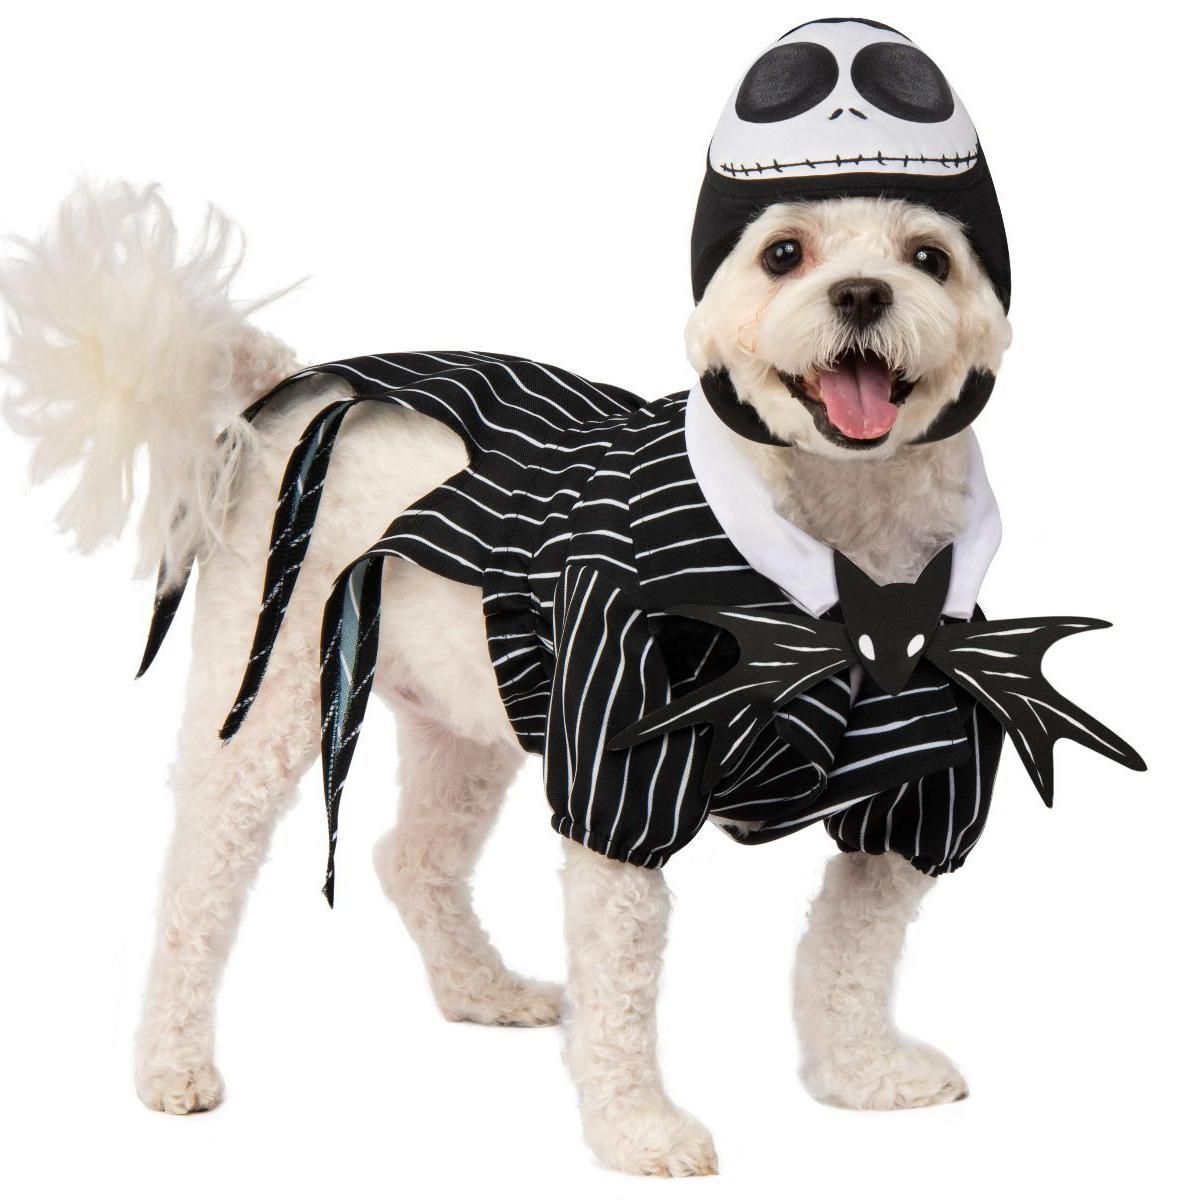 Beetlejuice Dog Fancy Dress Halloween Tim Burton Ghost Puppy Animal Pet Costume